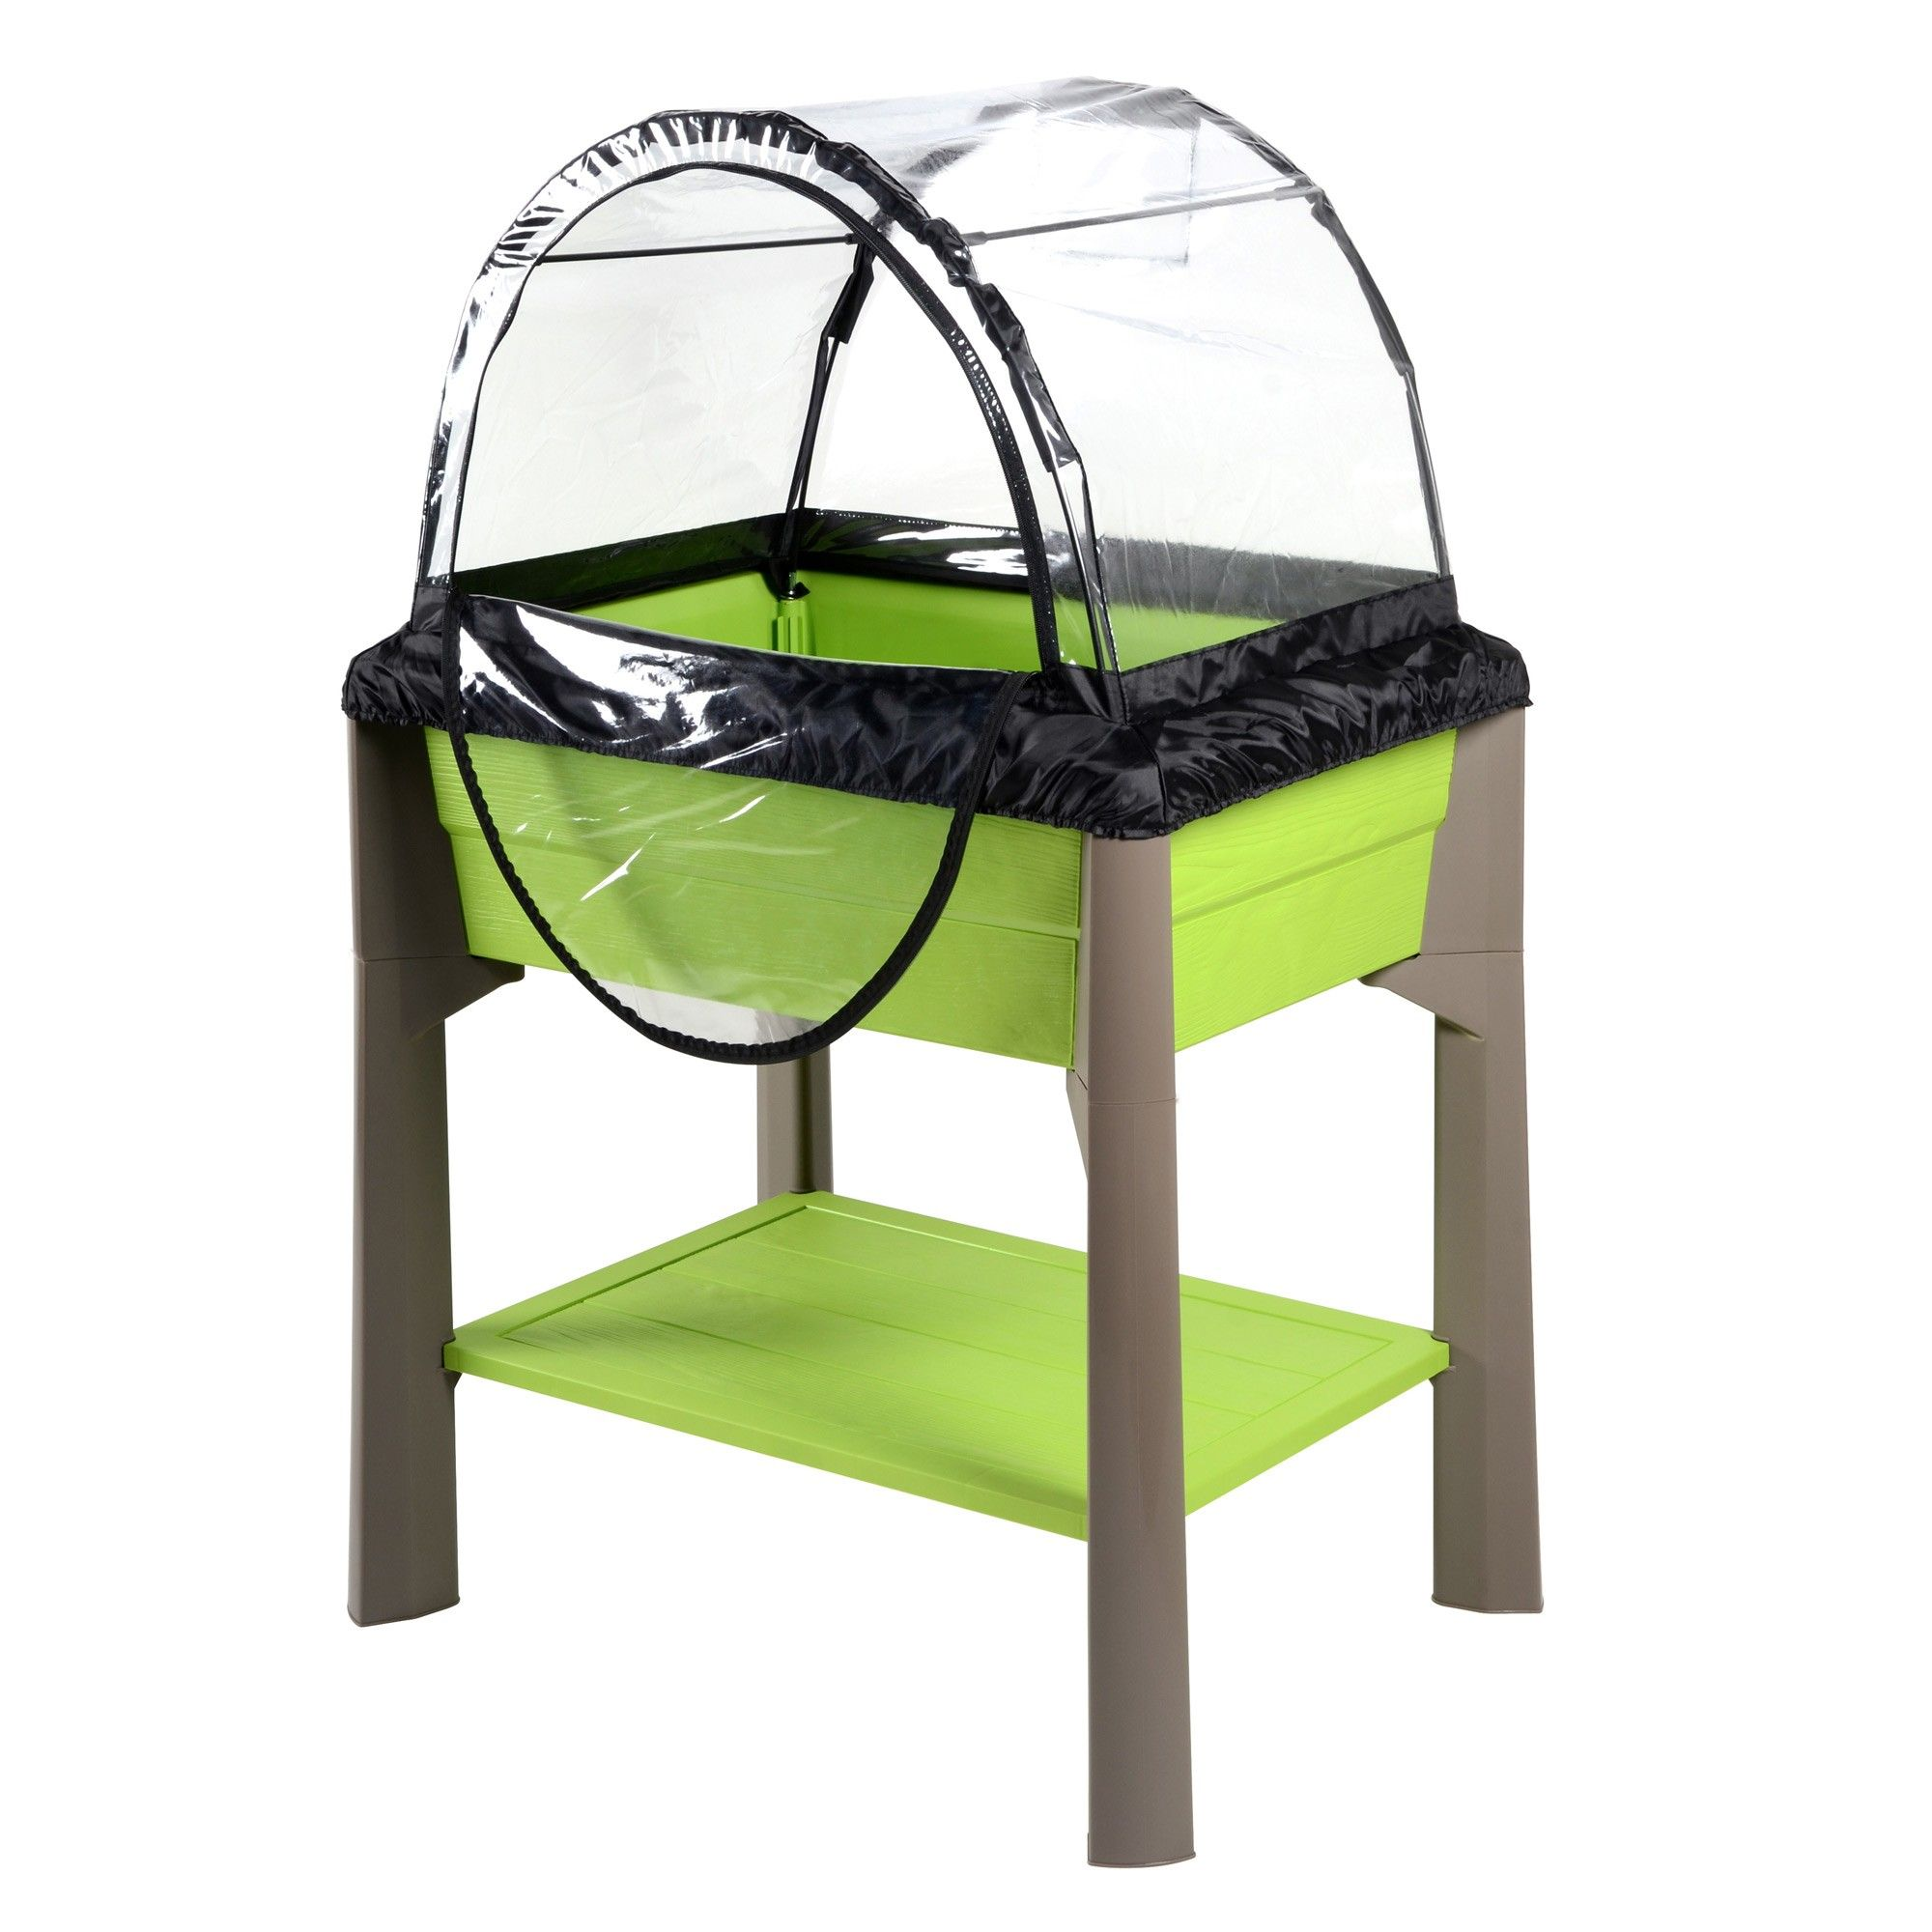 Espace Potager Veg Table Avec Serre Vert Pistache Taupe 79 X 59 X 80 Cm 67l Chambre De Culture Mini Serre De Jardin Serre De Jardin Polycarbonate